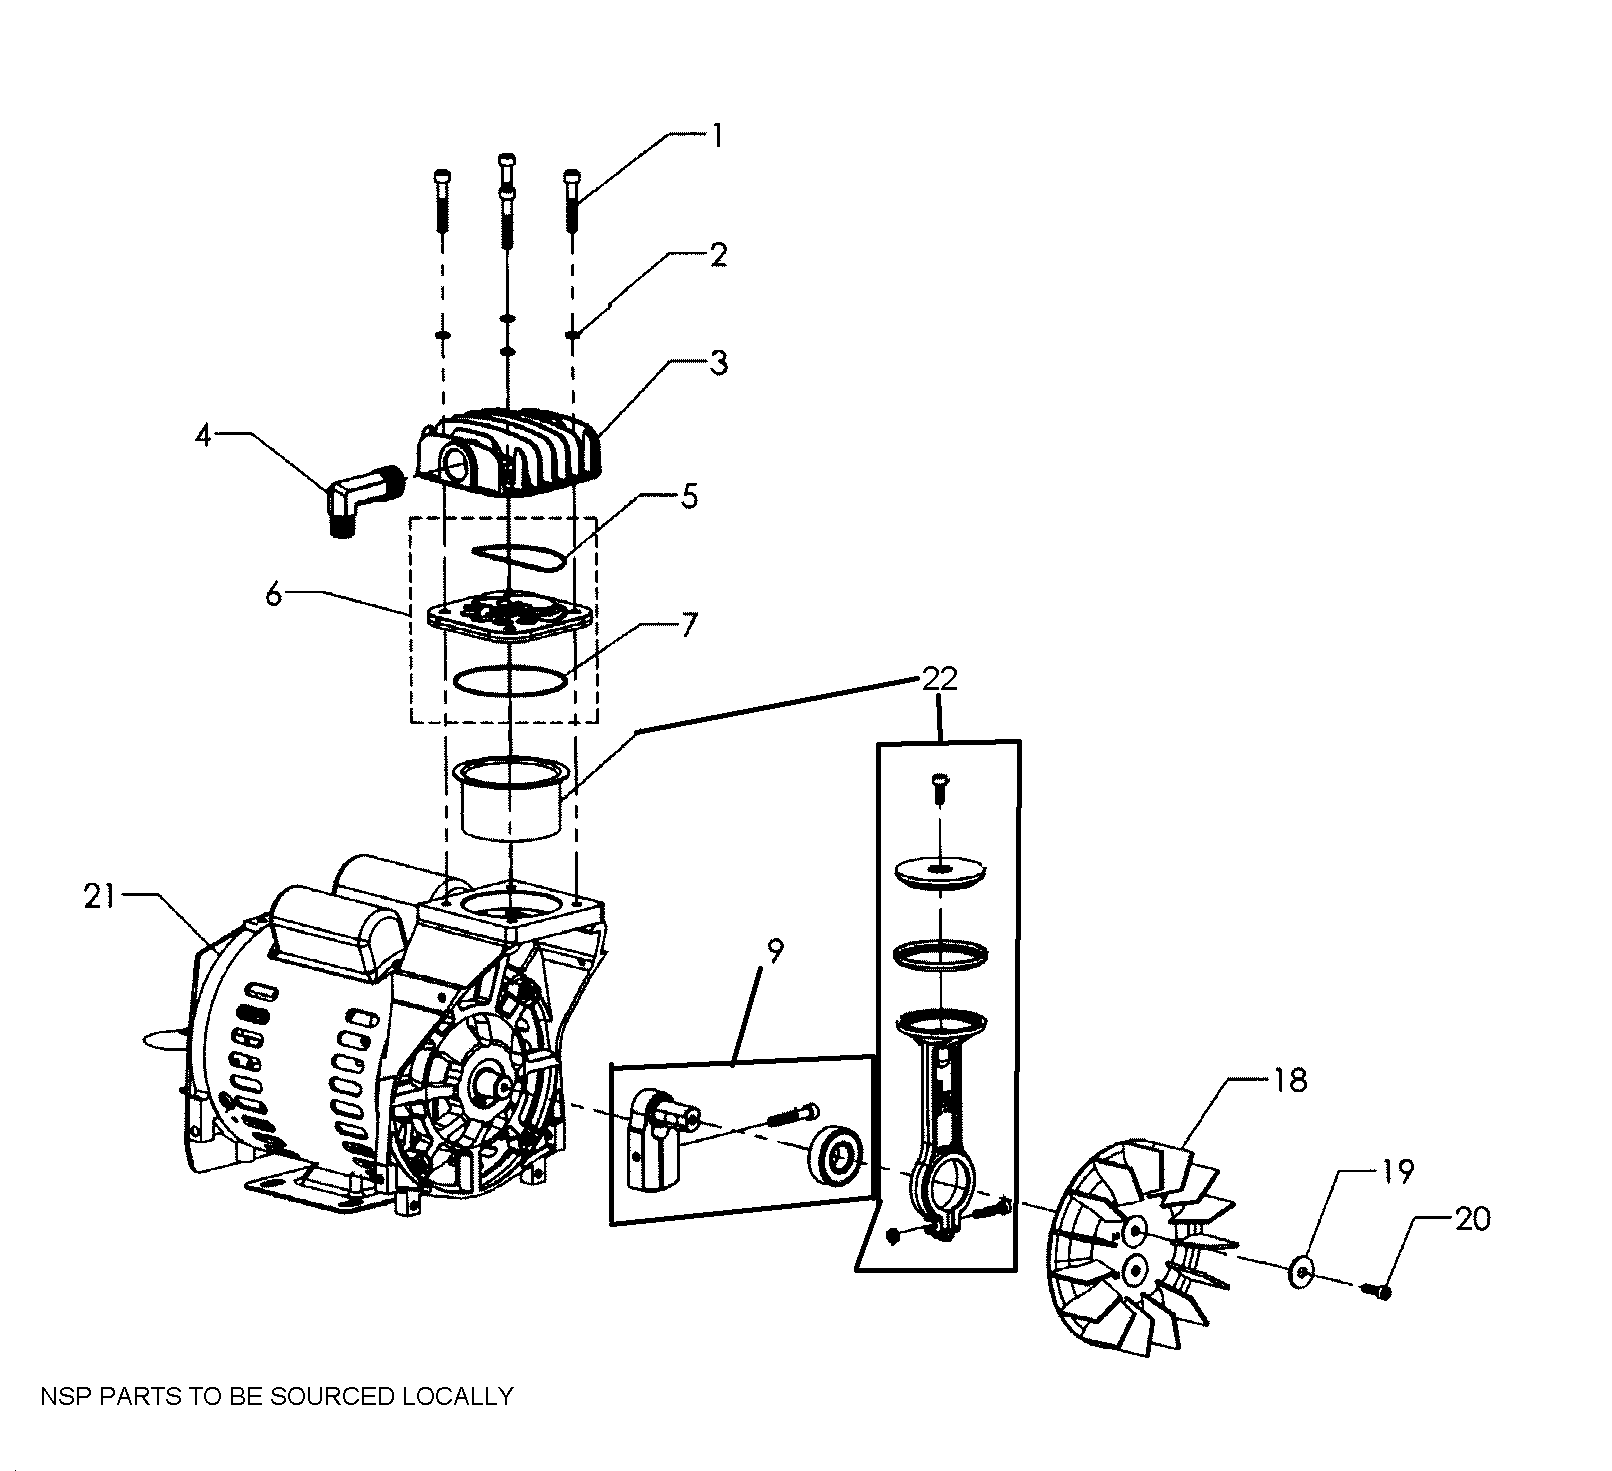 PUMP ASSY Diagram & Parts List for Model 92116473